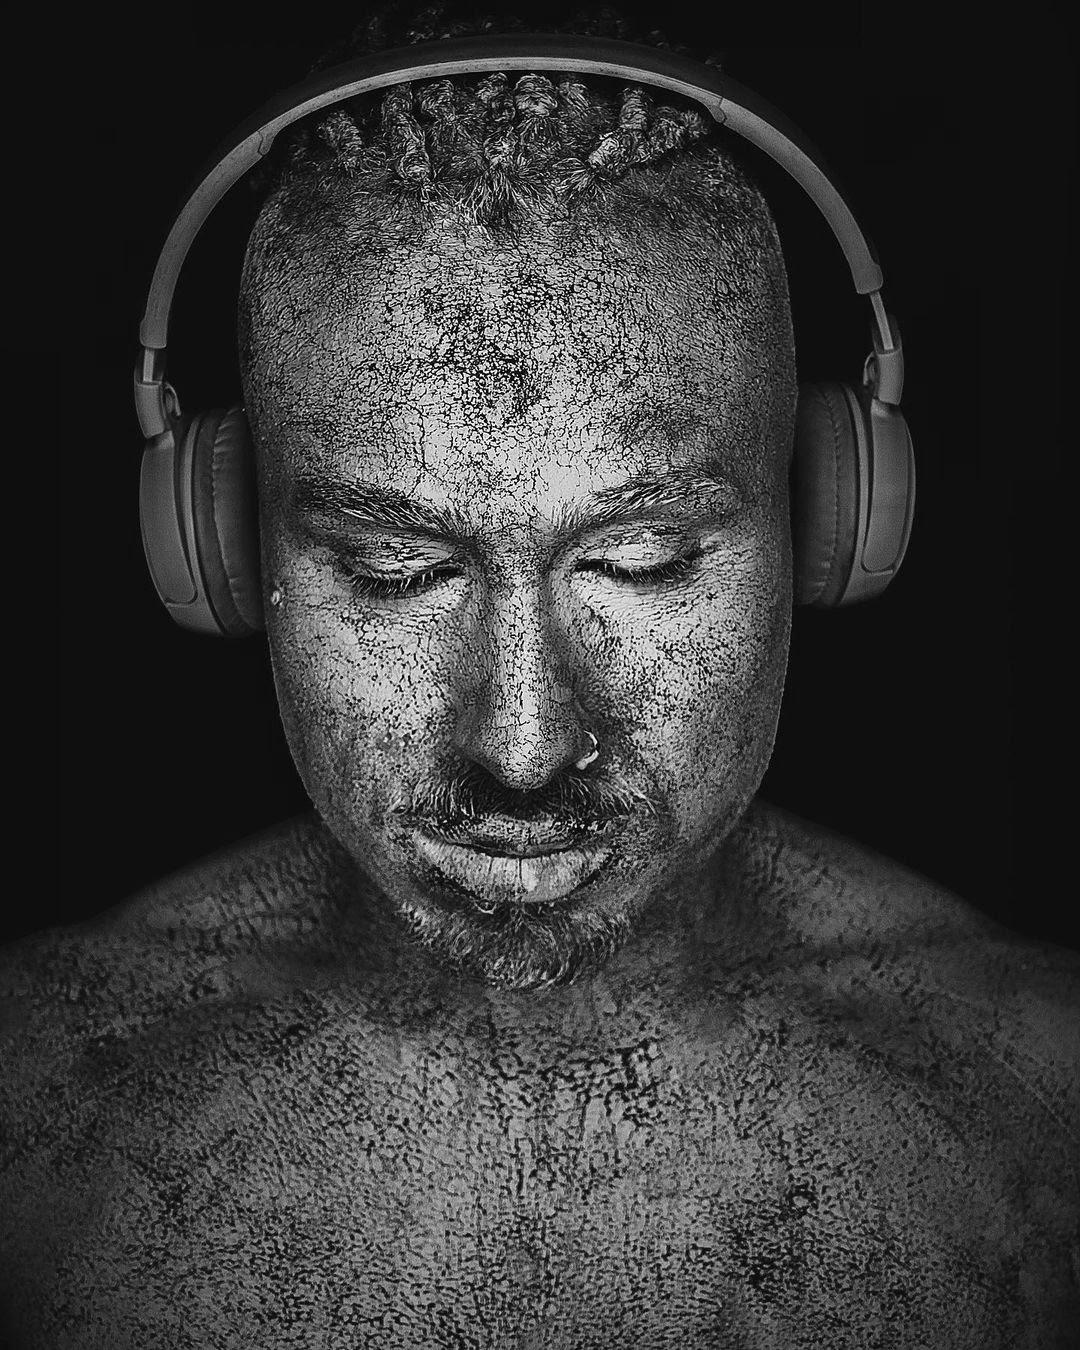 Recria tua VidA, SemprE, SemprE... Remove PedraS e planta RoseiraS... RecomeçA, by Thiago Duran Fotografia ft Victor Palermo